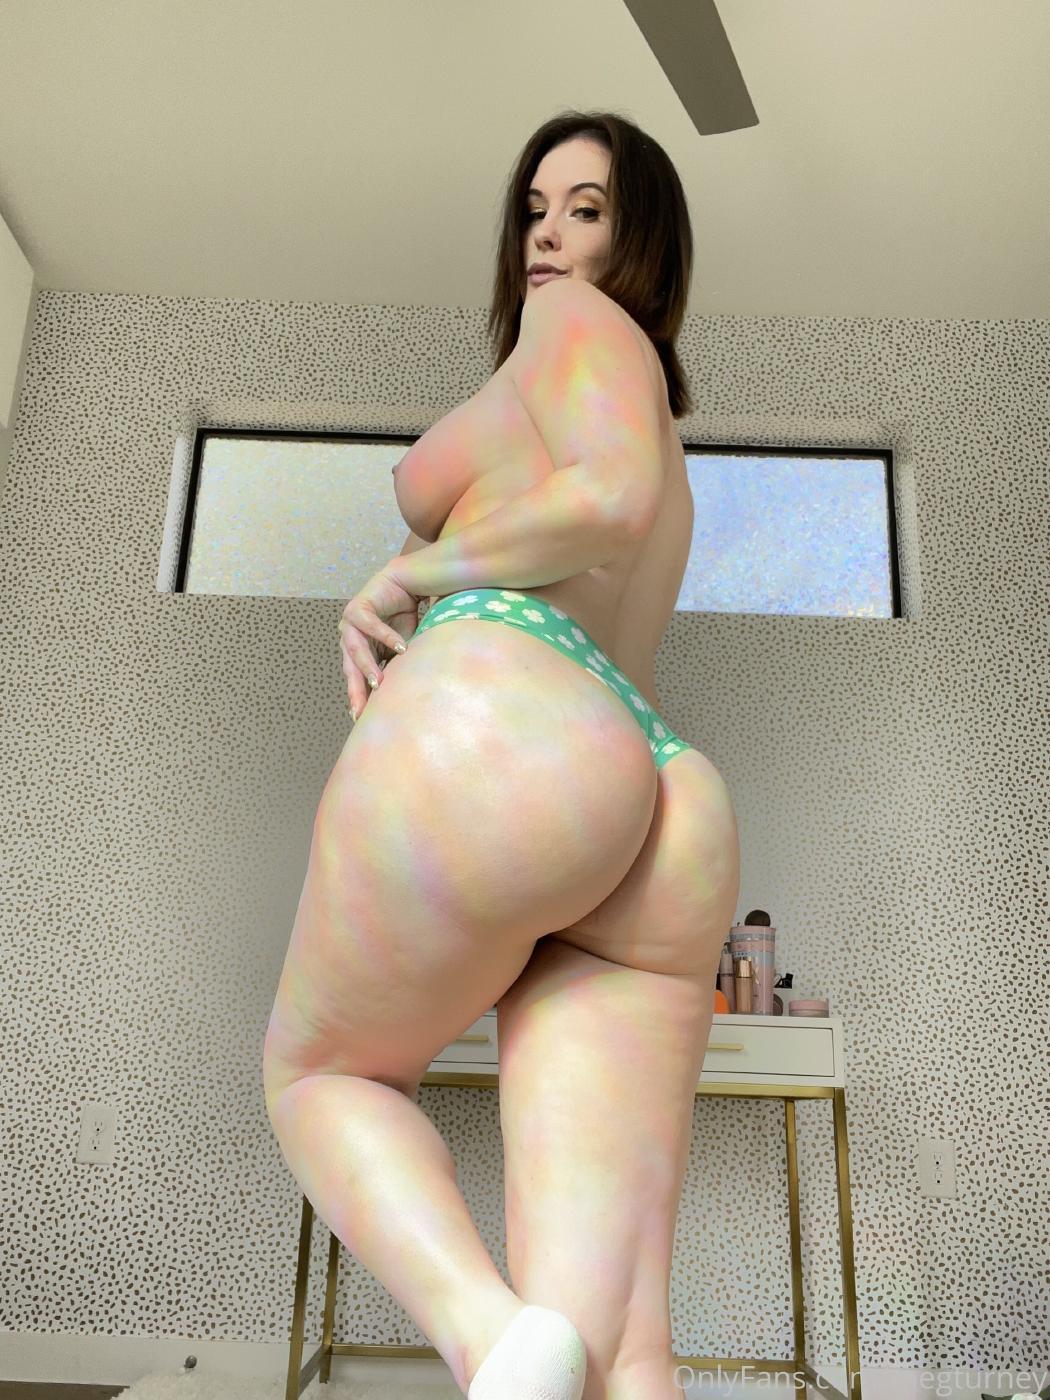 Meg Turney Nude Candid Onlyfans Set Leaked 0001